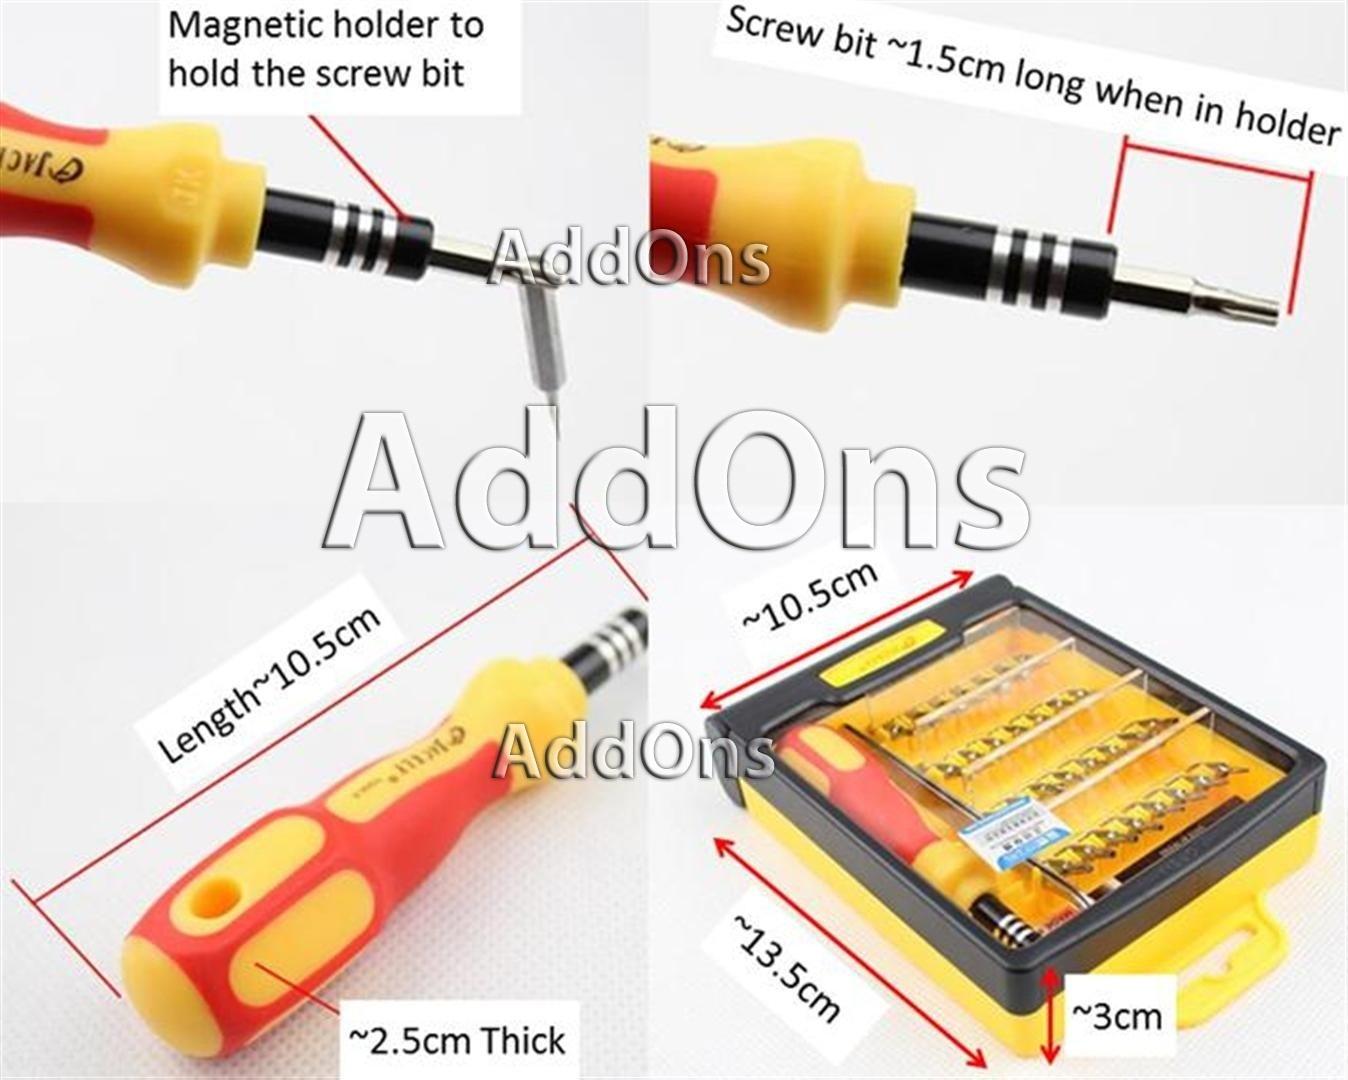 Http List Item Gsr1440 Li Bosch Cordless Drill Light Bar 3quot Bull Clamps Mounting Bracket Wiring Harness Ebay 508969398 04g 0 W St G